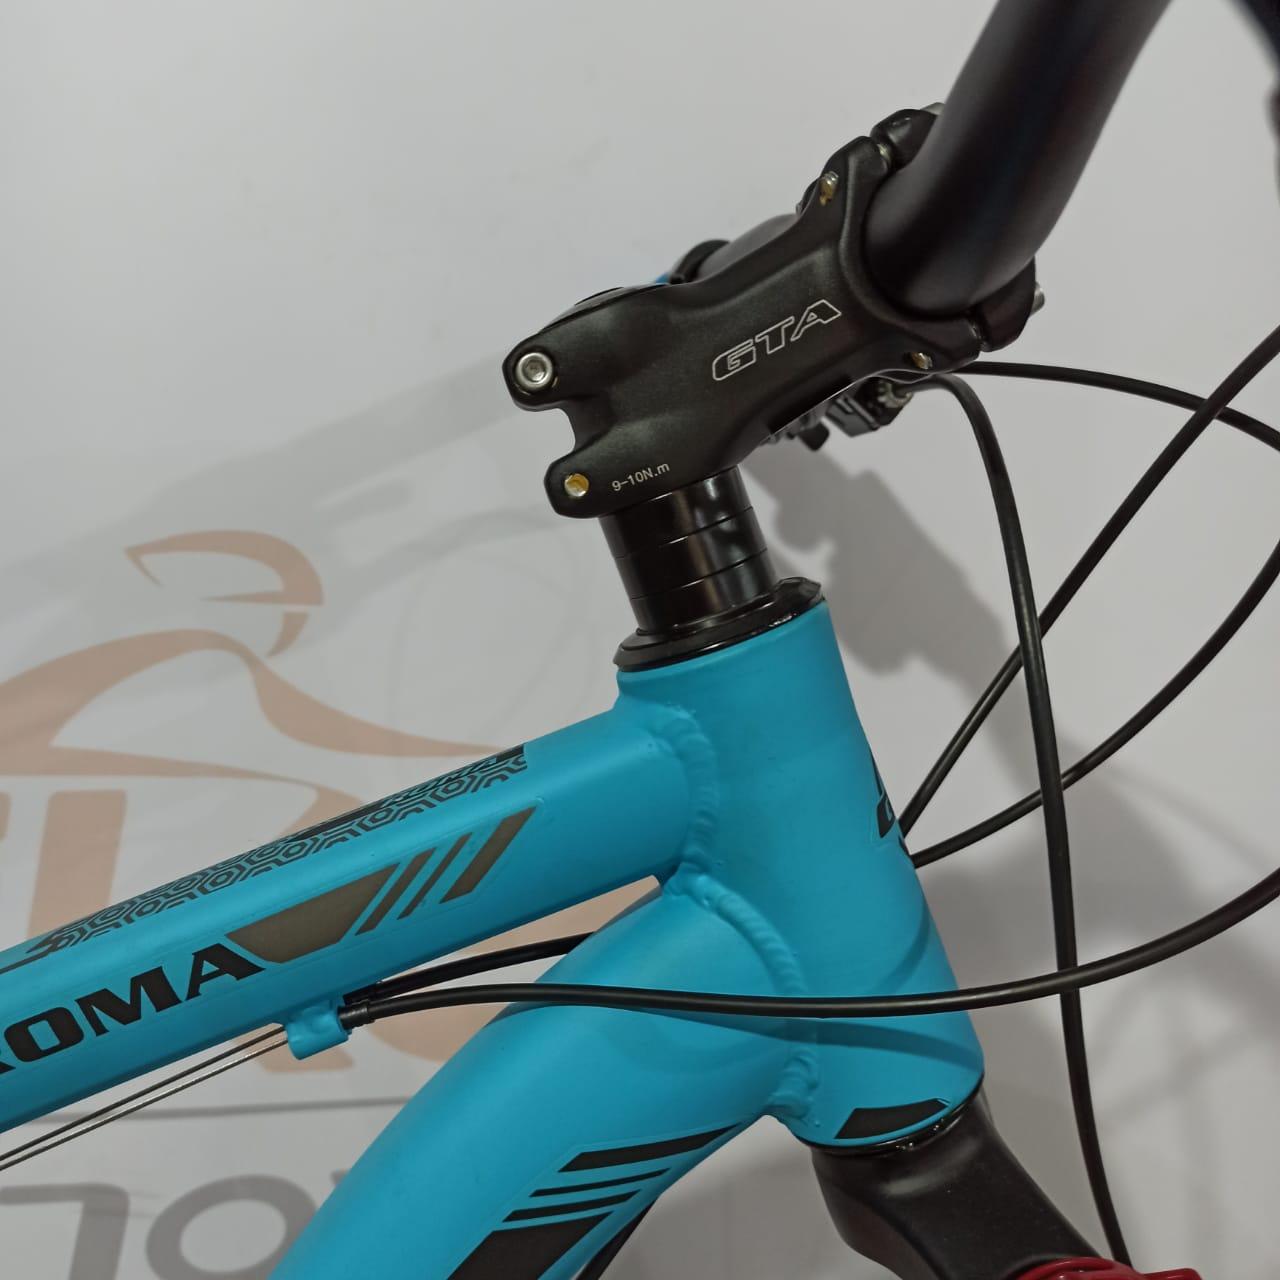 Bicicleta GTI Roma aro 29 - 21v Shimano Tourney - Freio a Disco Veloforce - Suspensão GTA trava no ombro